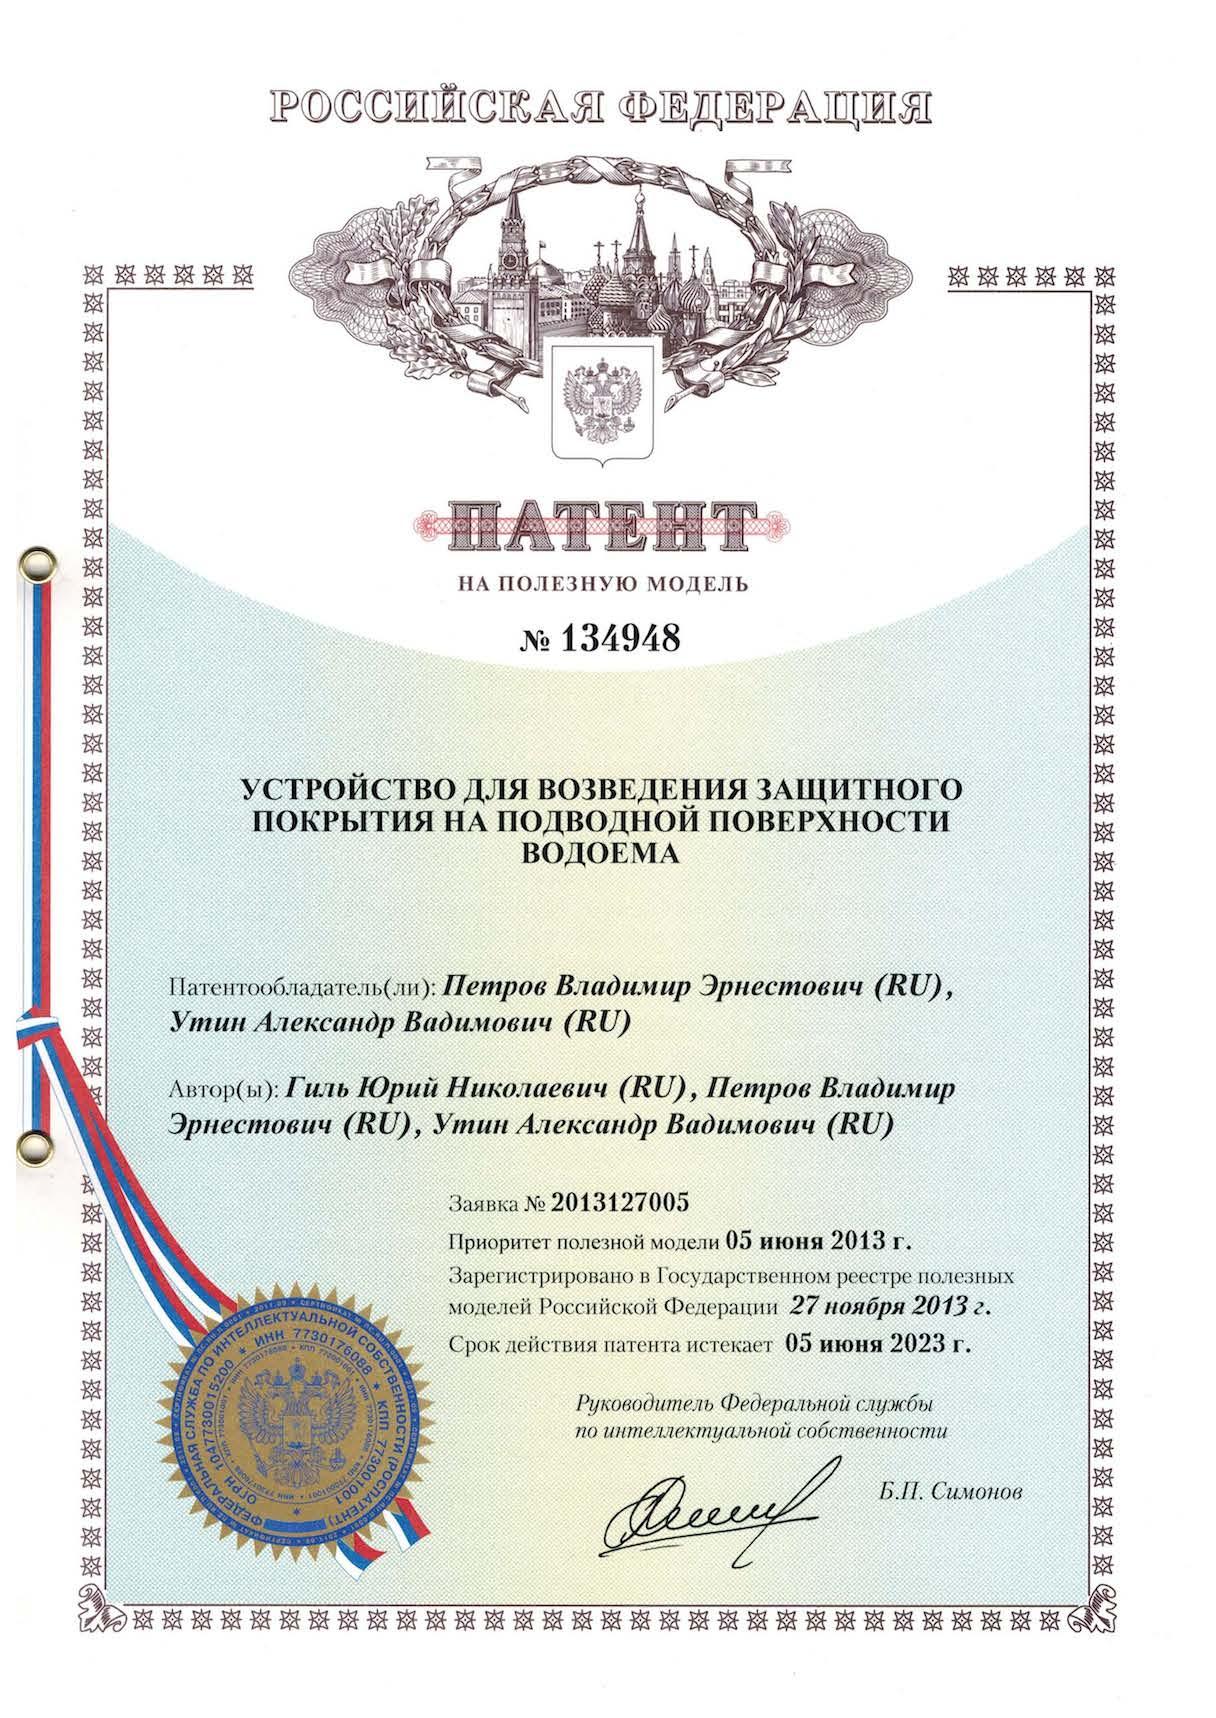 patent_seaground2